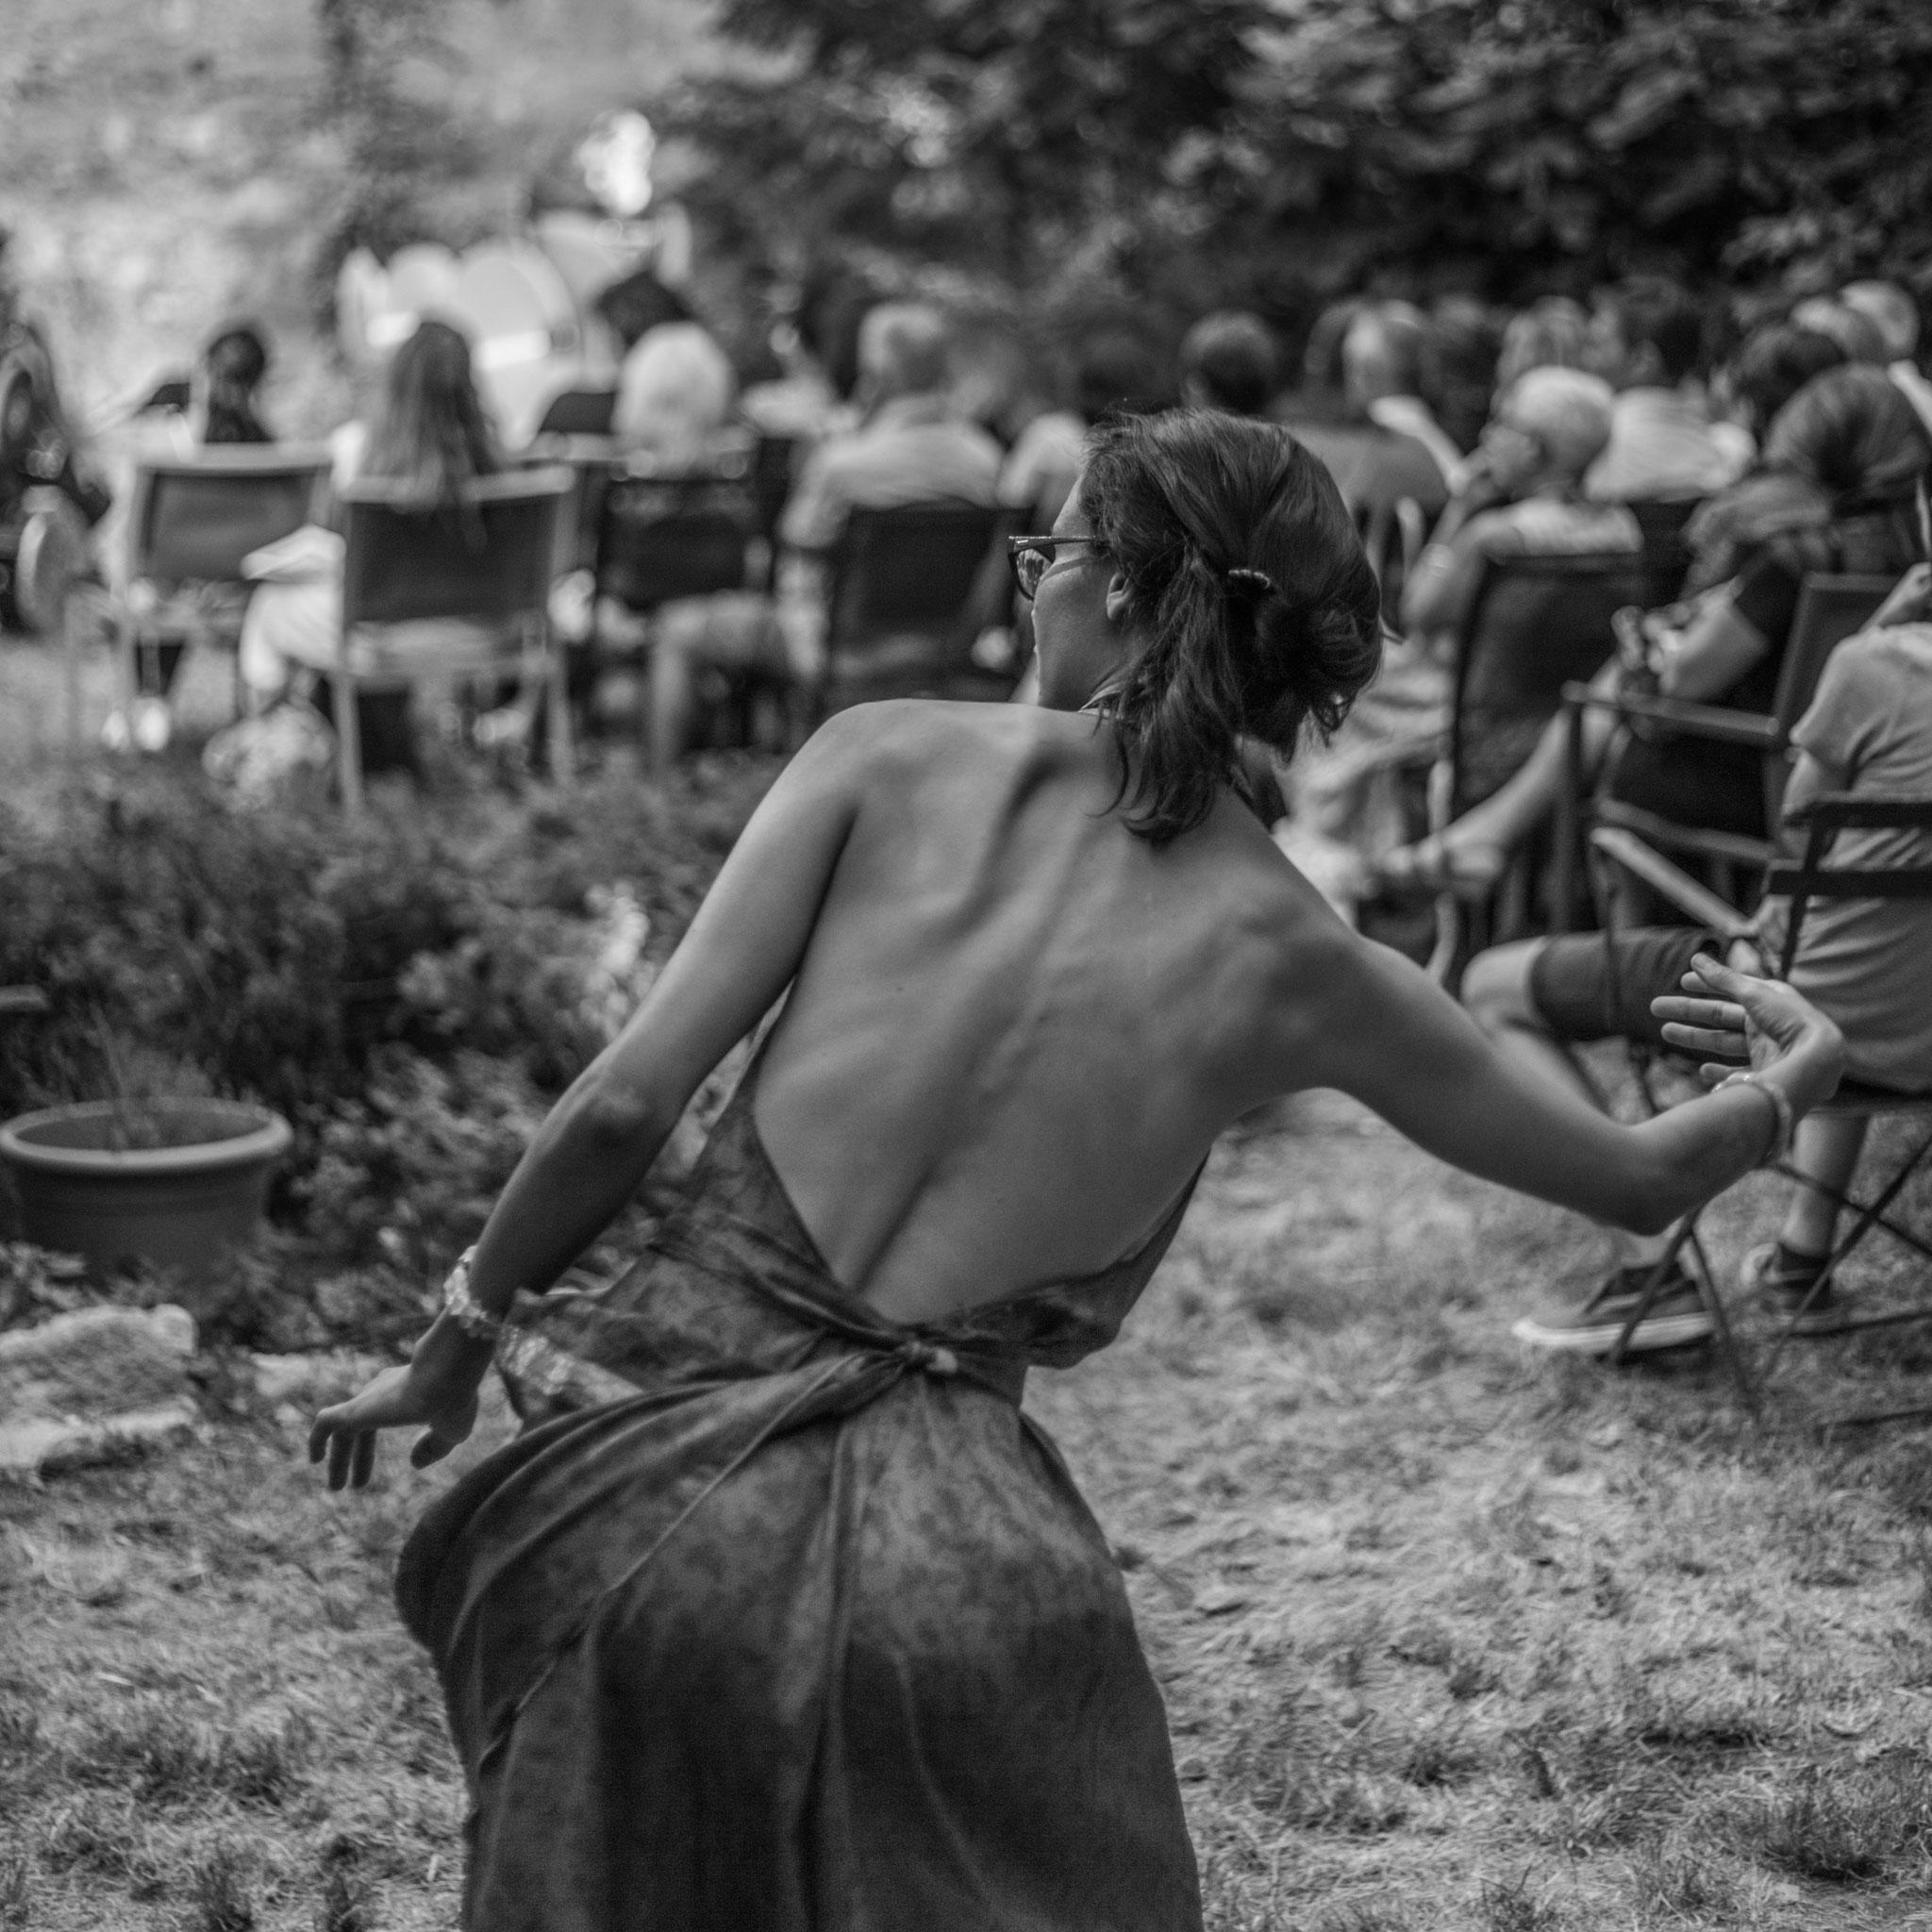 ©Benjamin Chauvet 2017